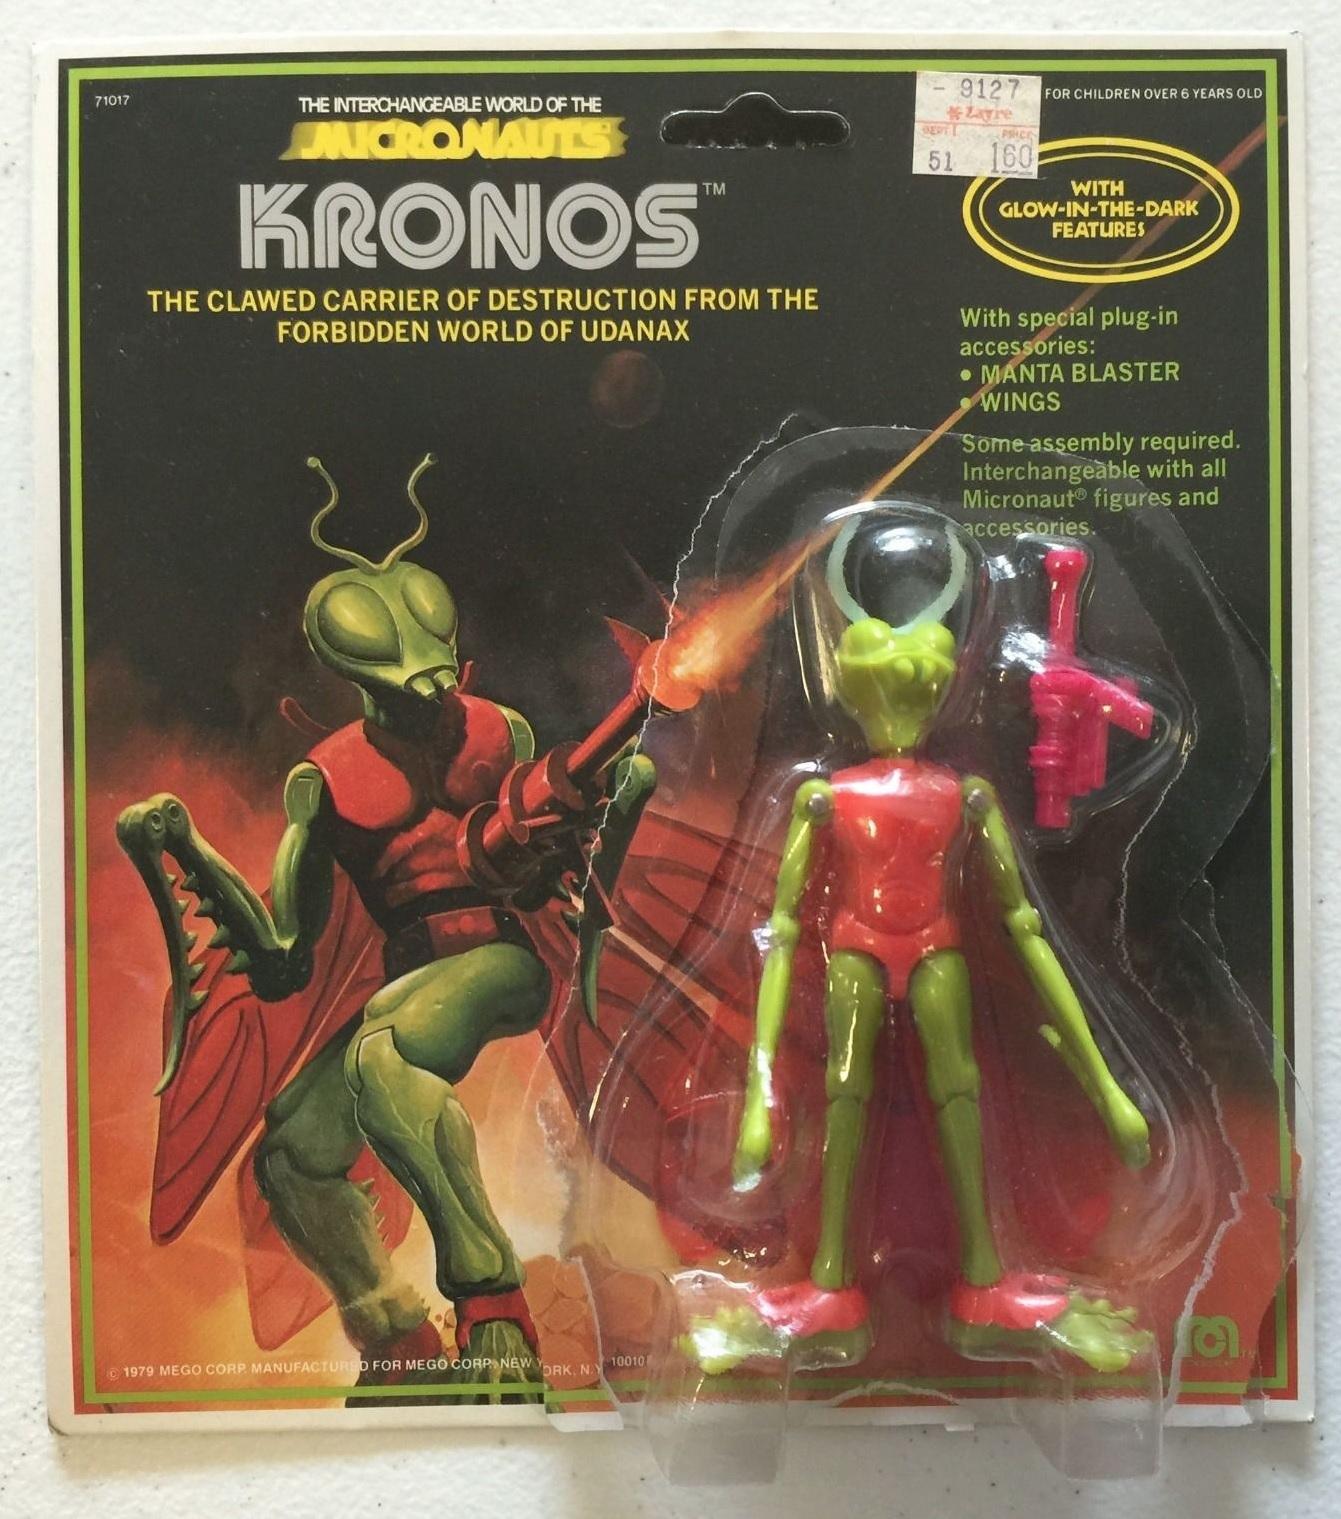 Micronauts Kronos